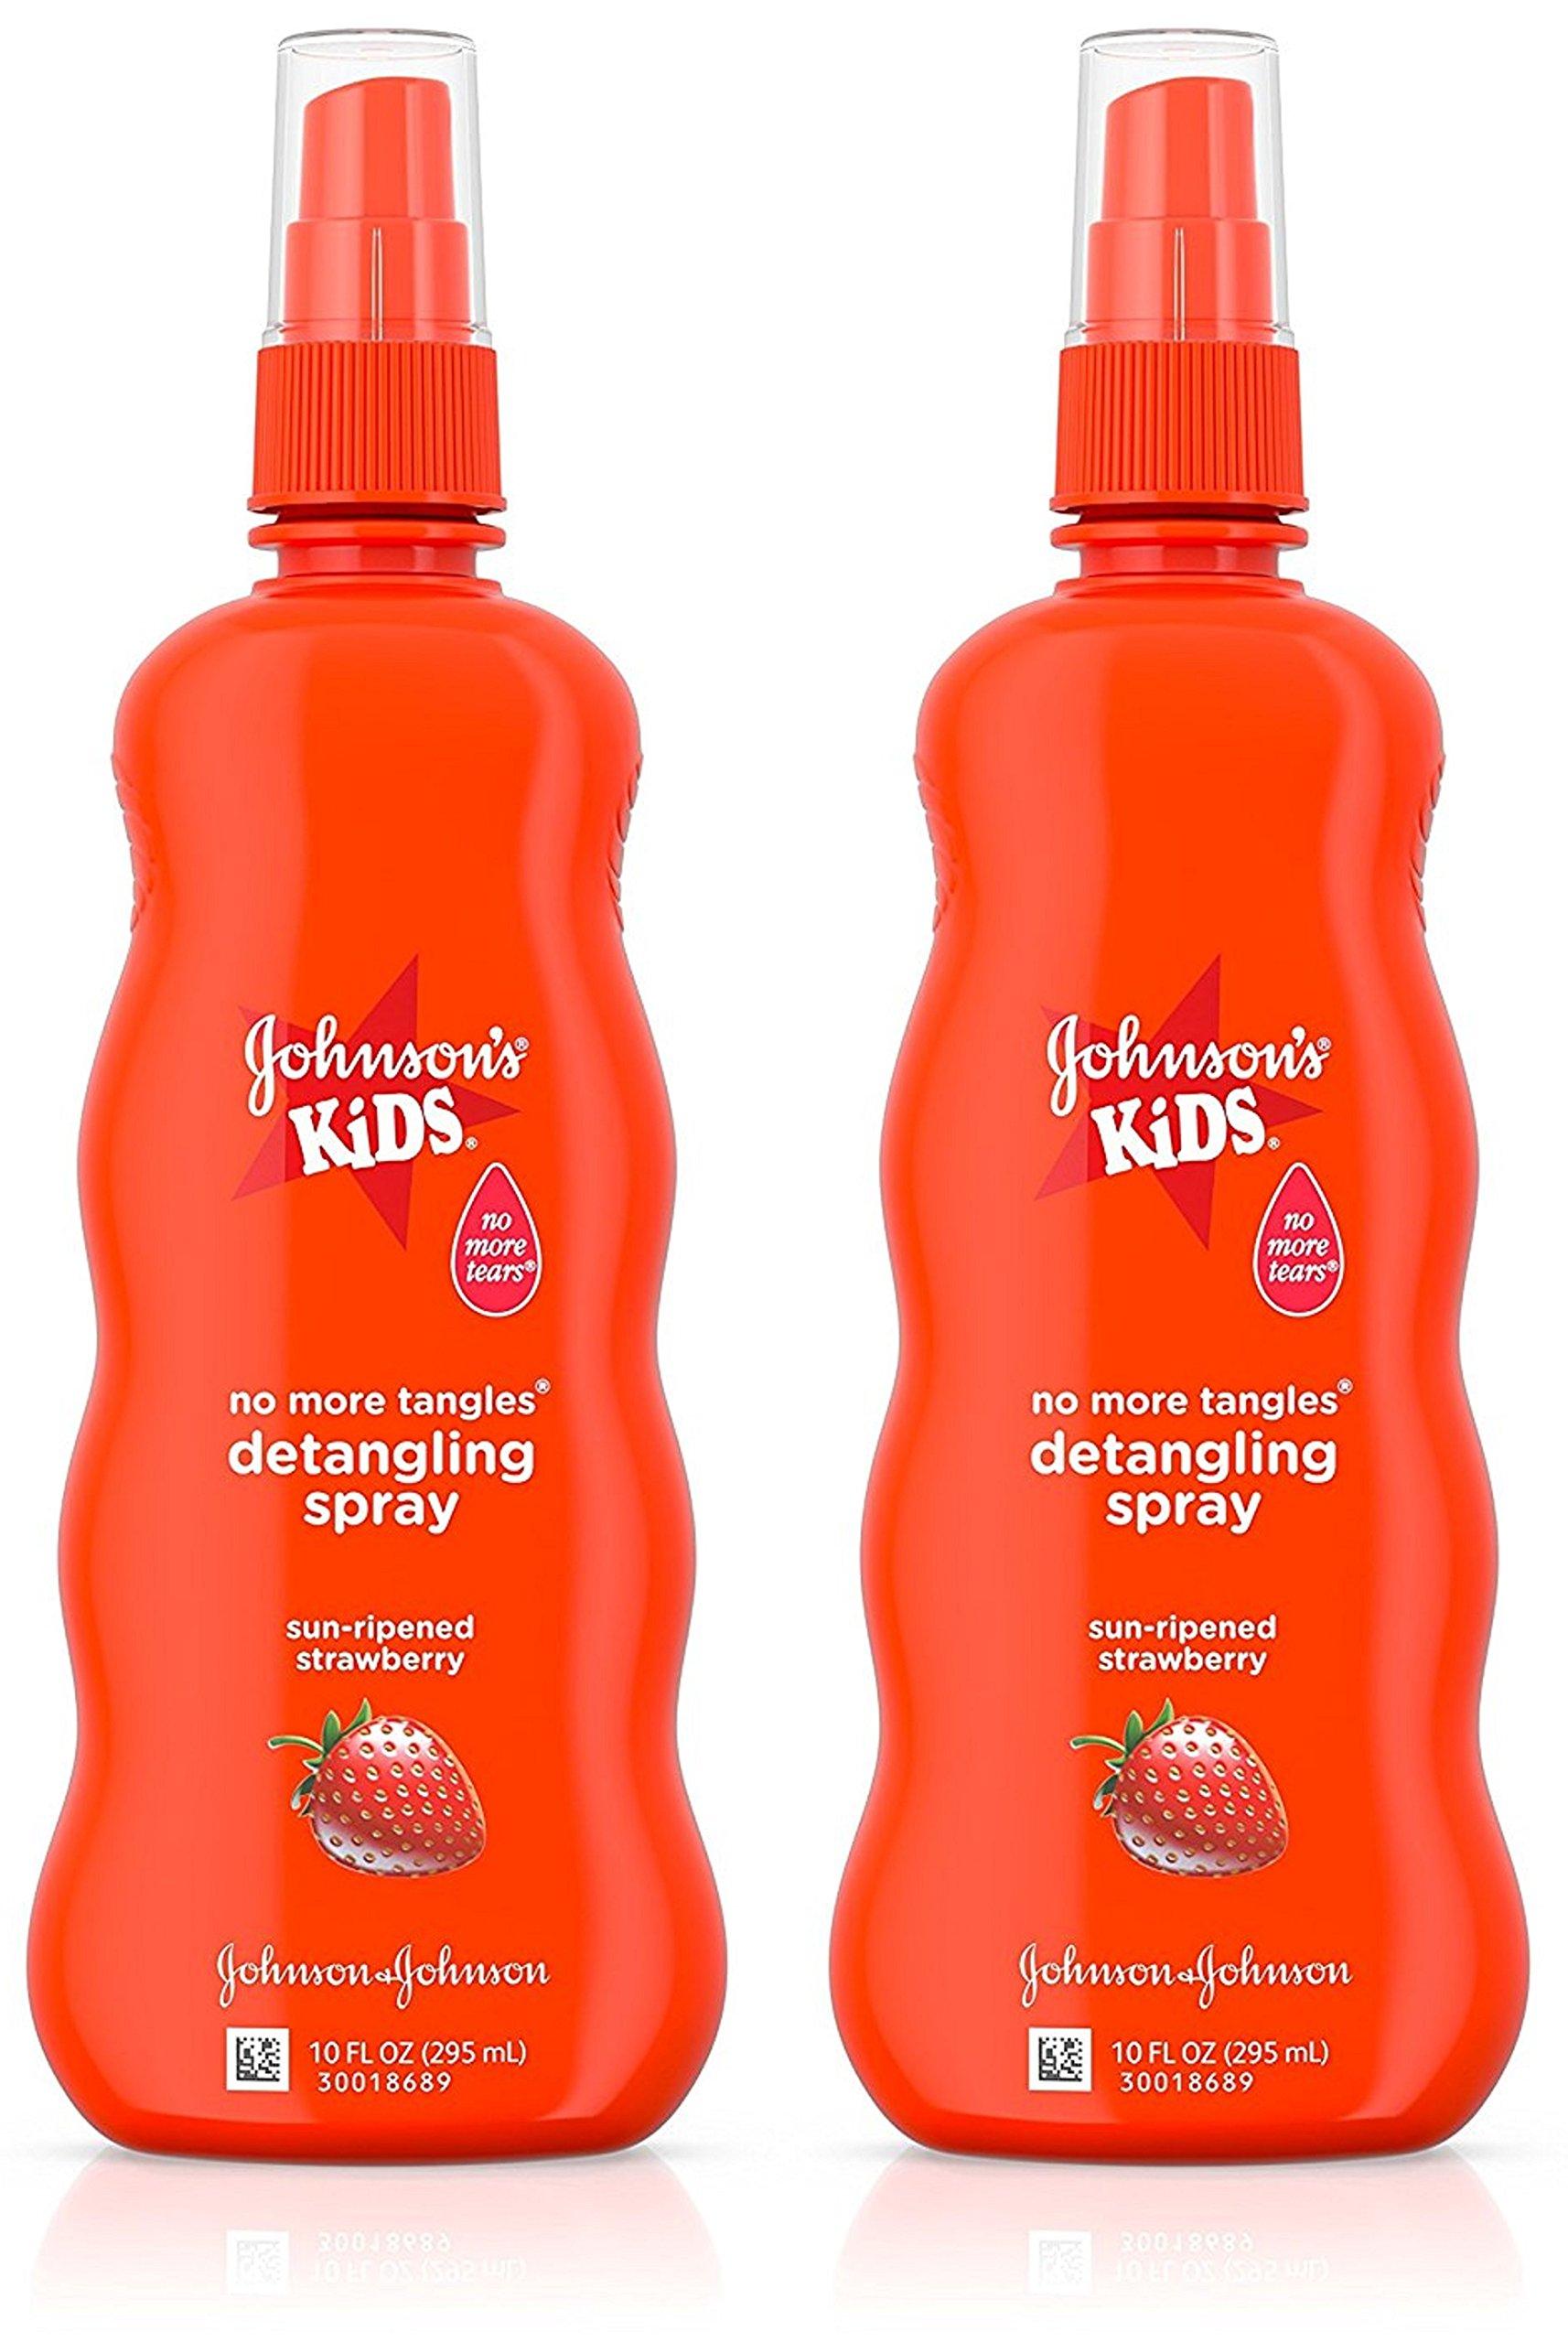 Johnson's Kids No More Tangles Detangling Spray, Strawberry 10 fl oz (295 ml)(PACK OF 2) by Johnson